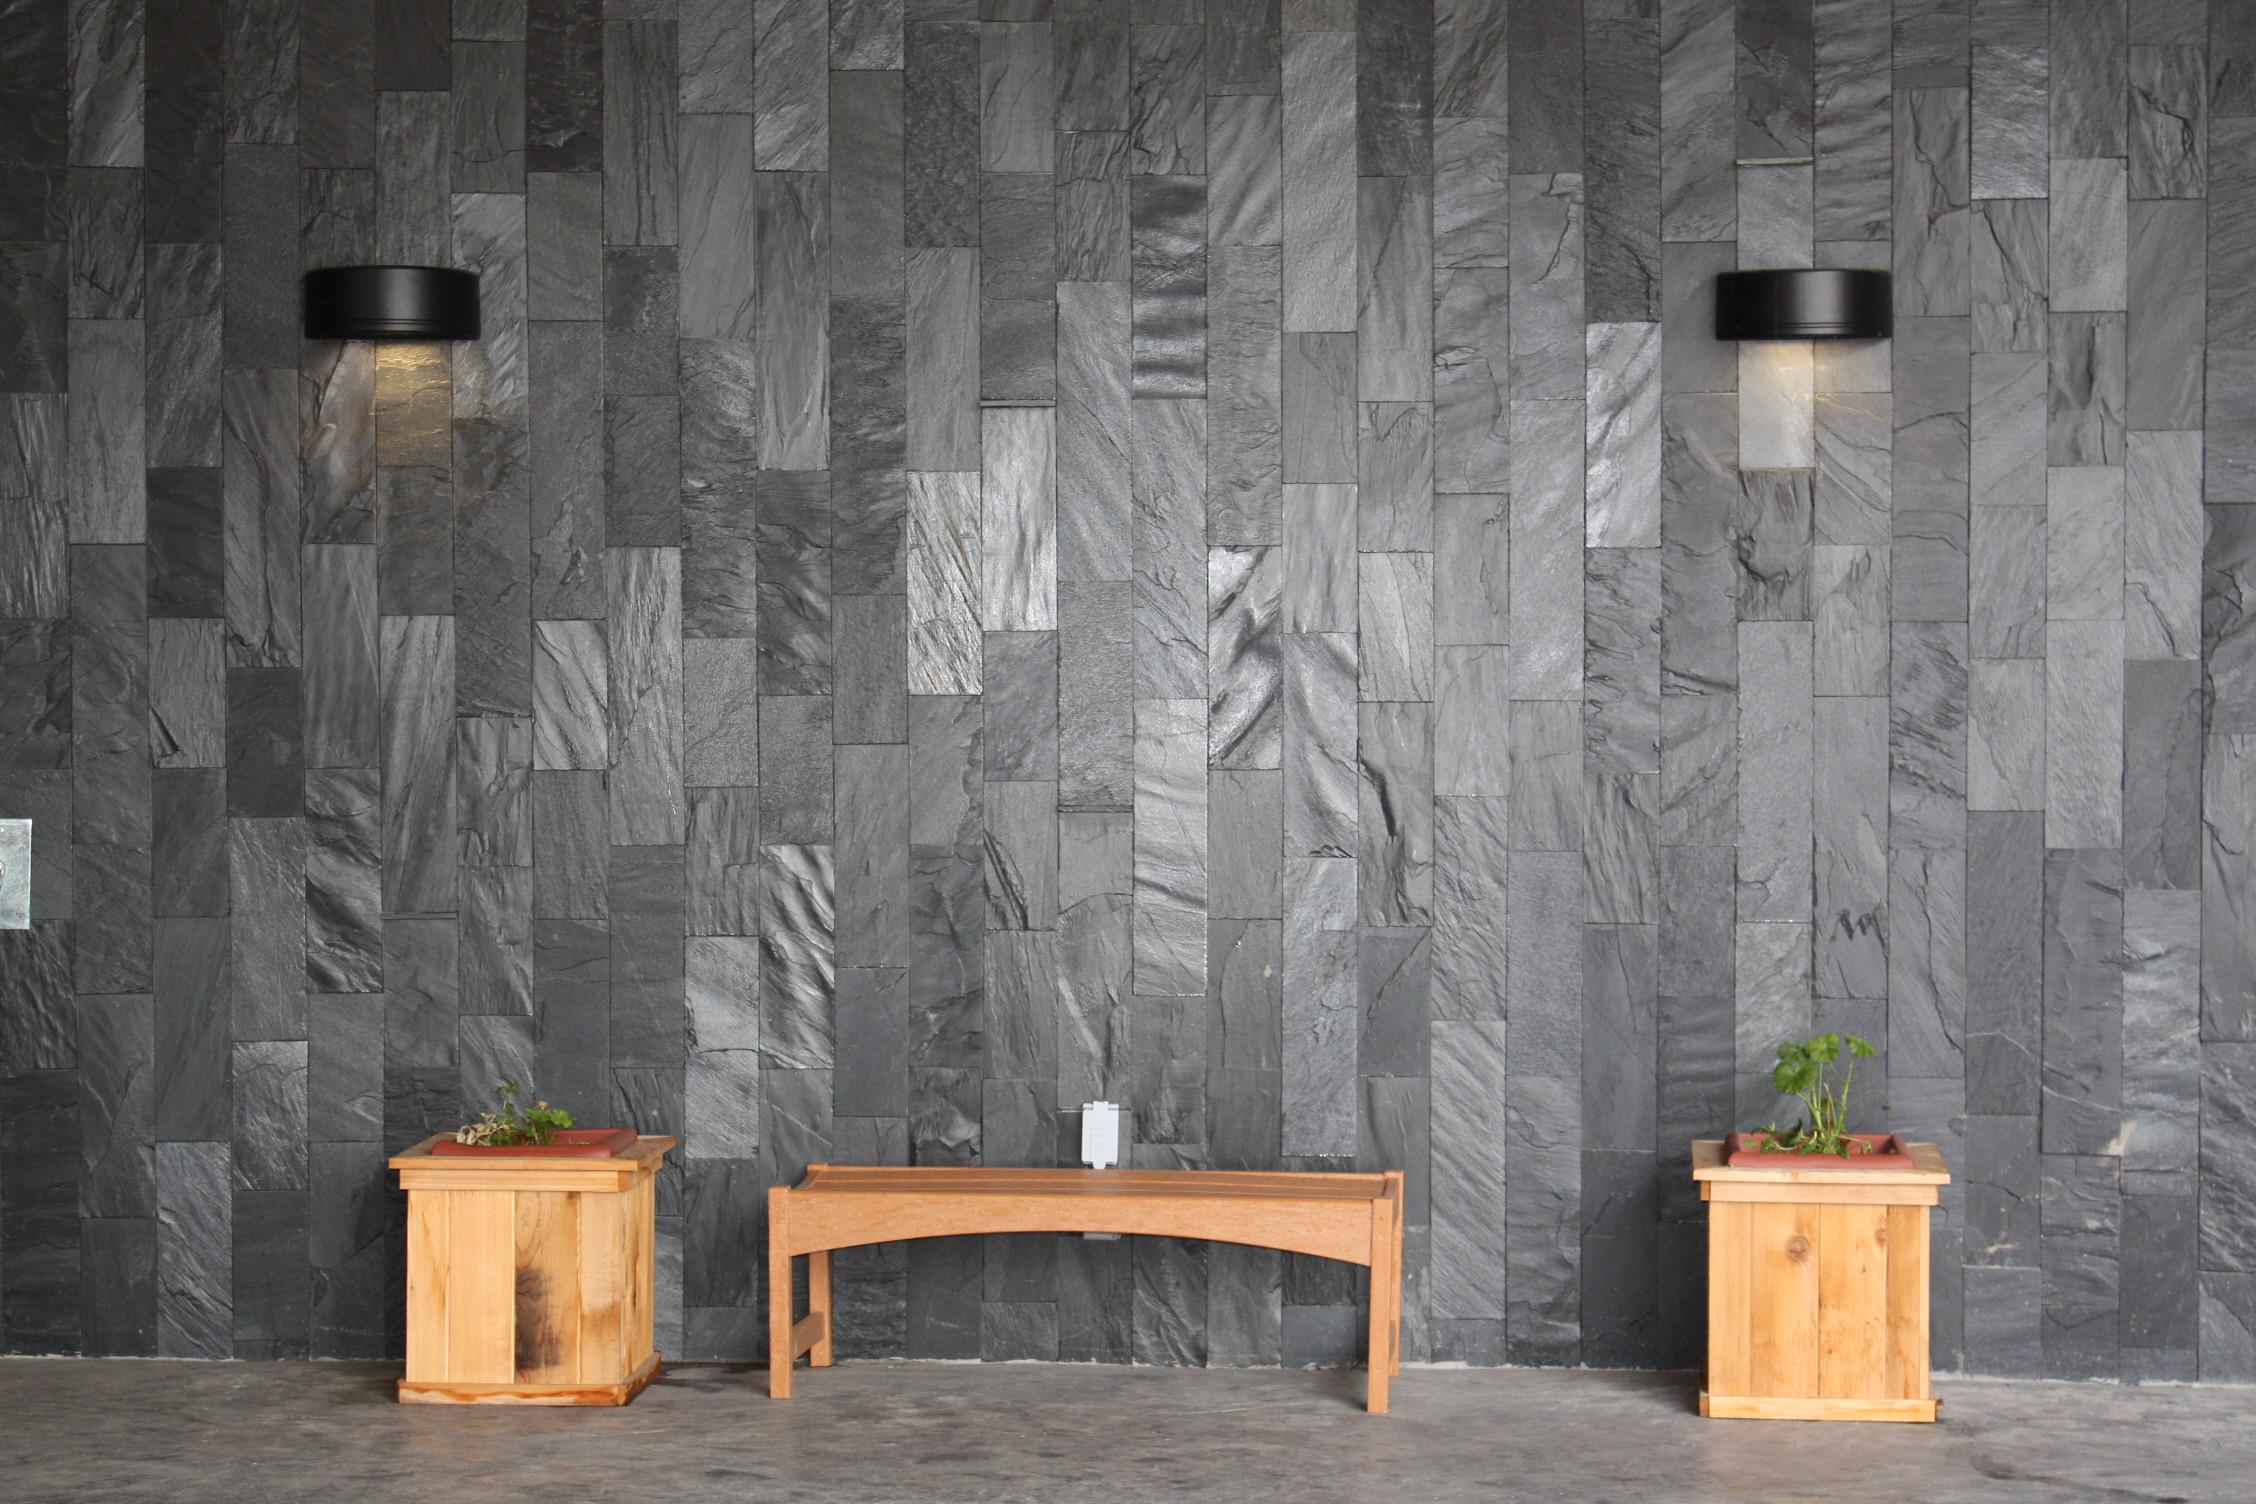 Amazing Brazilian Restaurant Without Walls WEST COAST Contemporary Ucluelet Design Musing